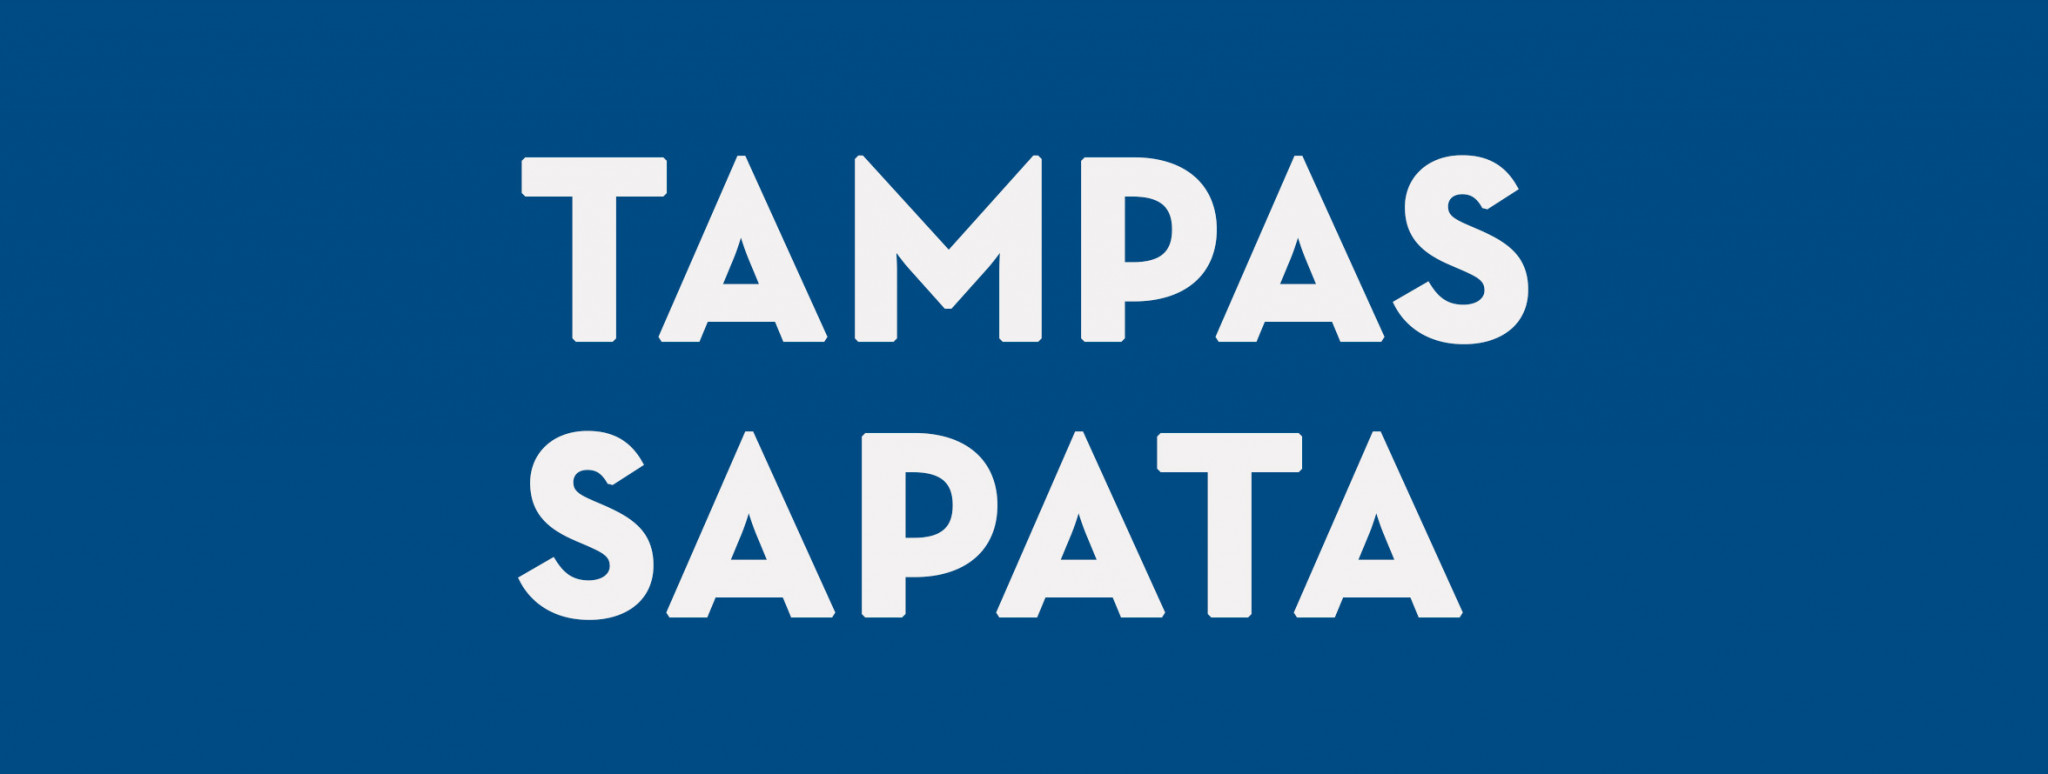 Tampas Sapata